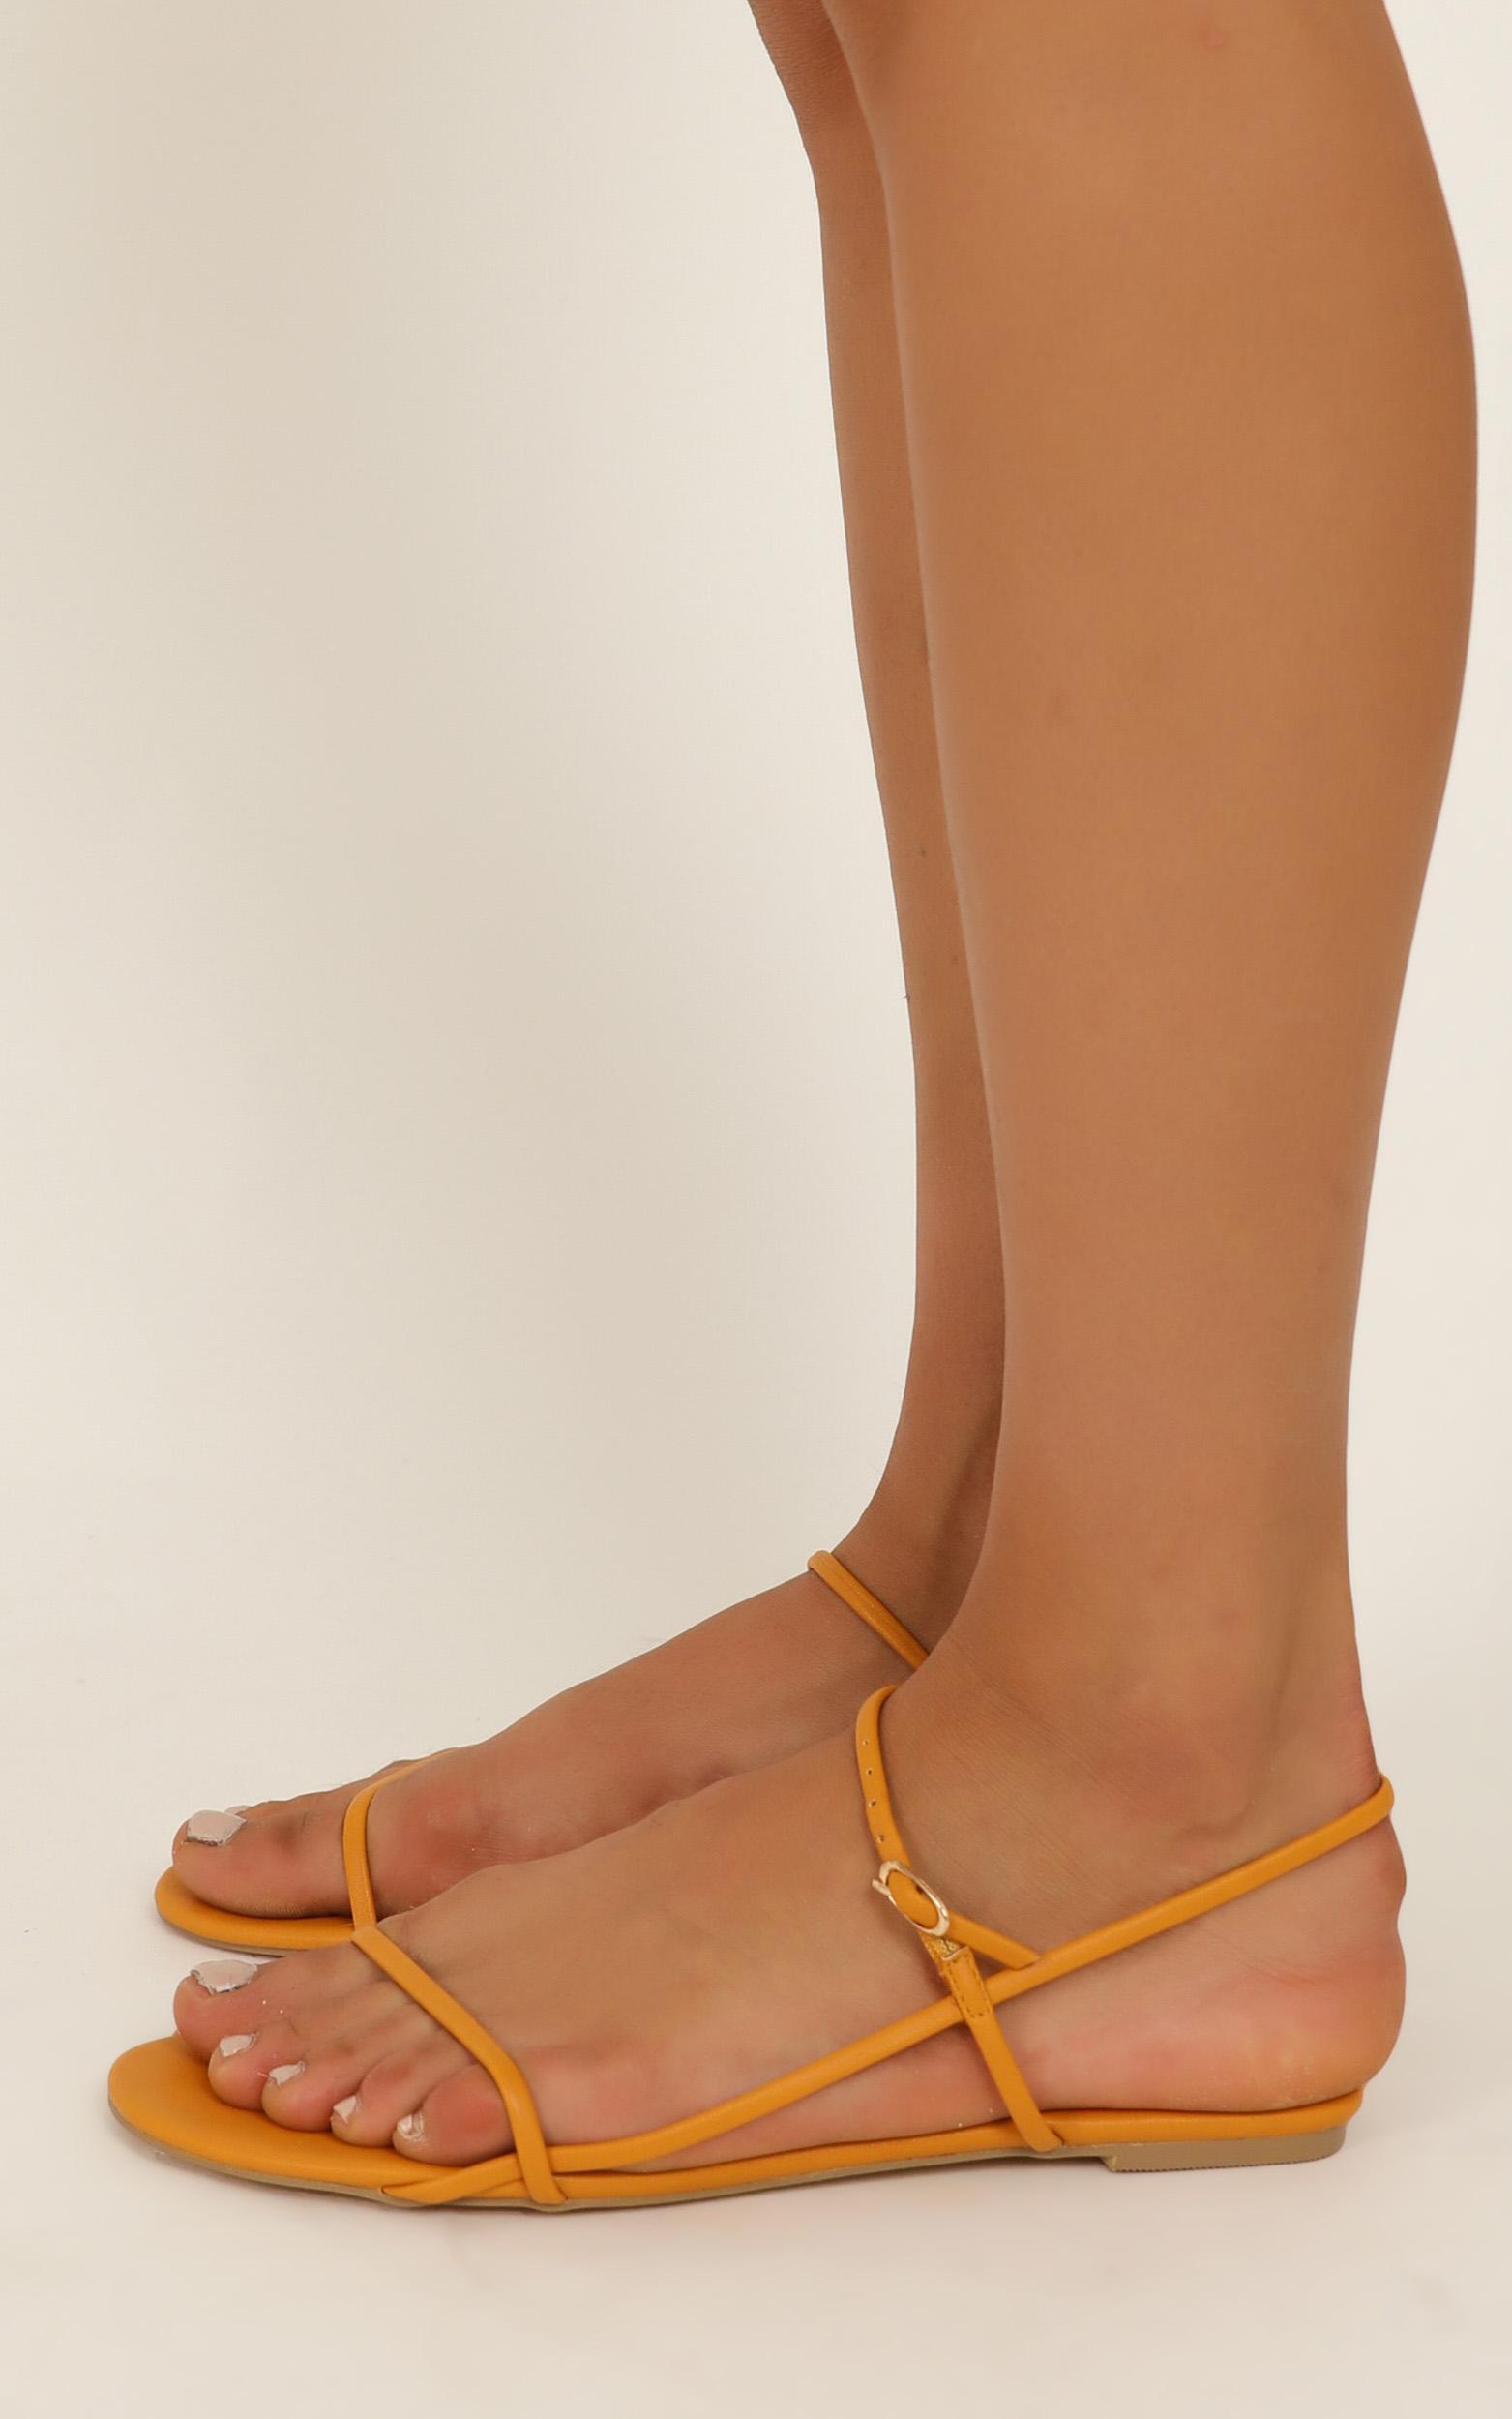 Billini - Patchouli sandals in spice - 10, Orange, hi-res image number null